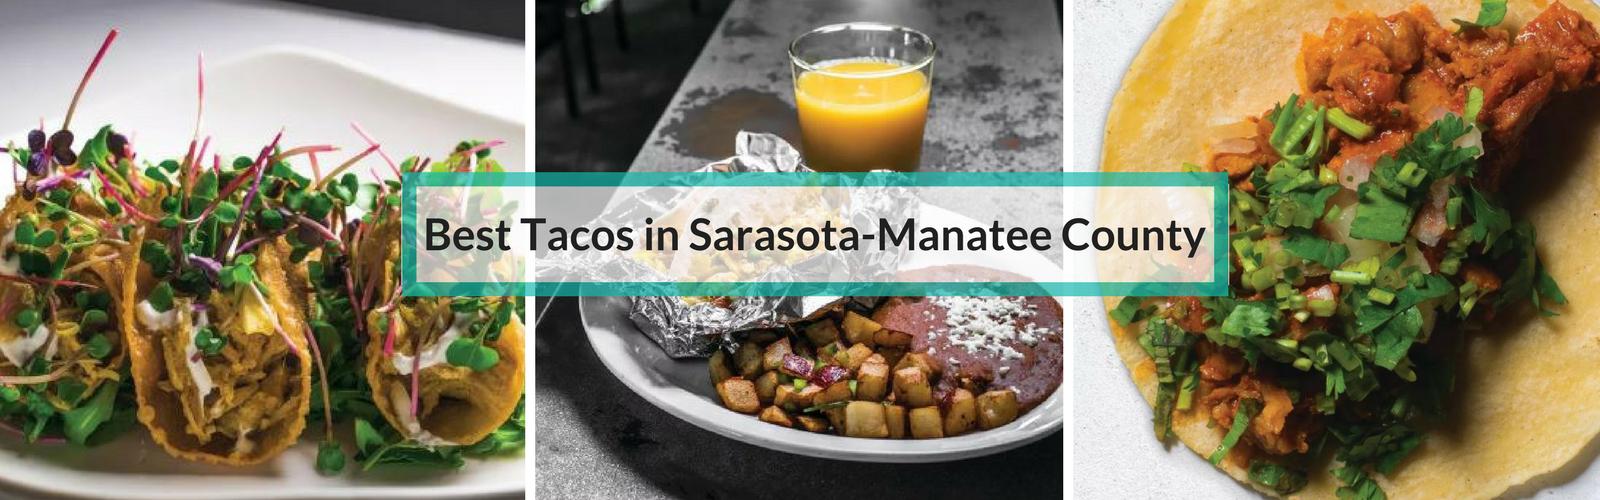 Best Tacos in Sarasota